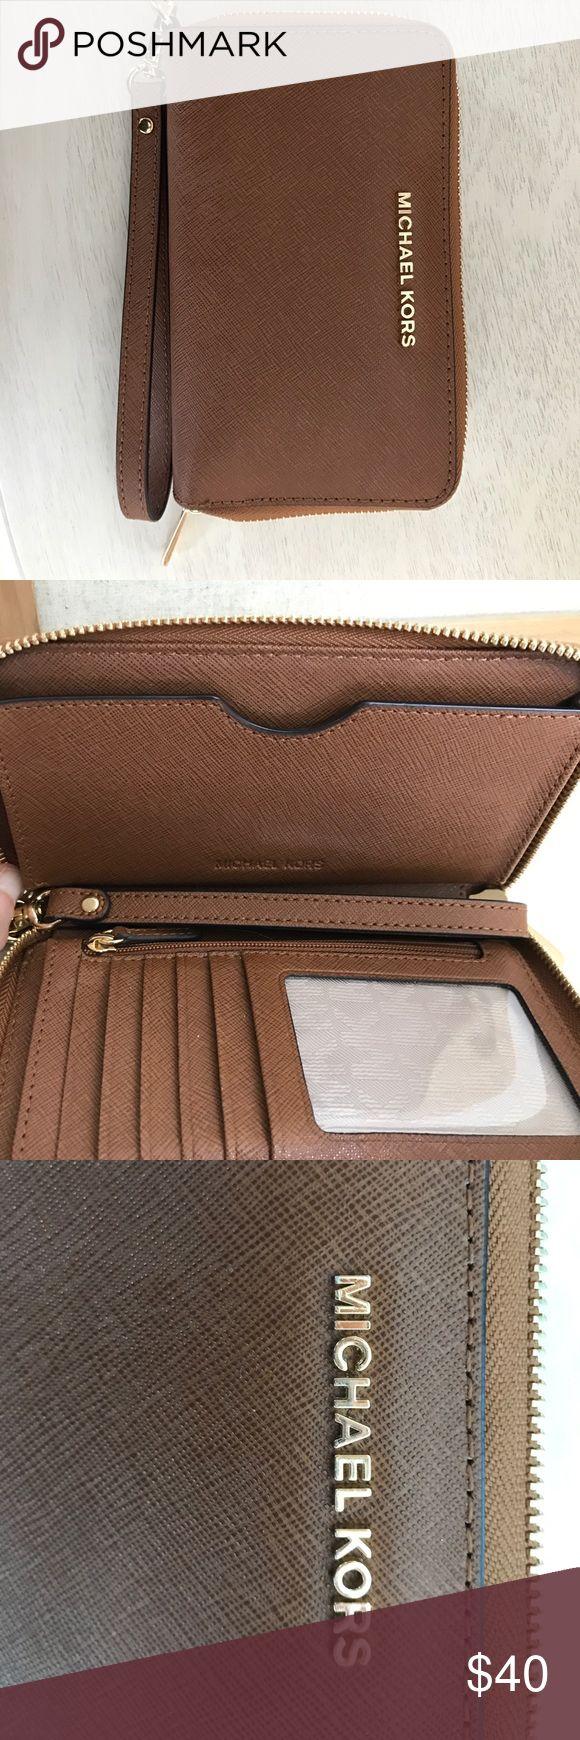 Michael Kors Jet Set Wallet MK Jet Set Wallet in color luggage EXCELLENT Condition. Michael Kors Bags Wallets